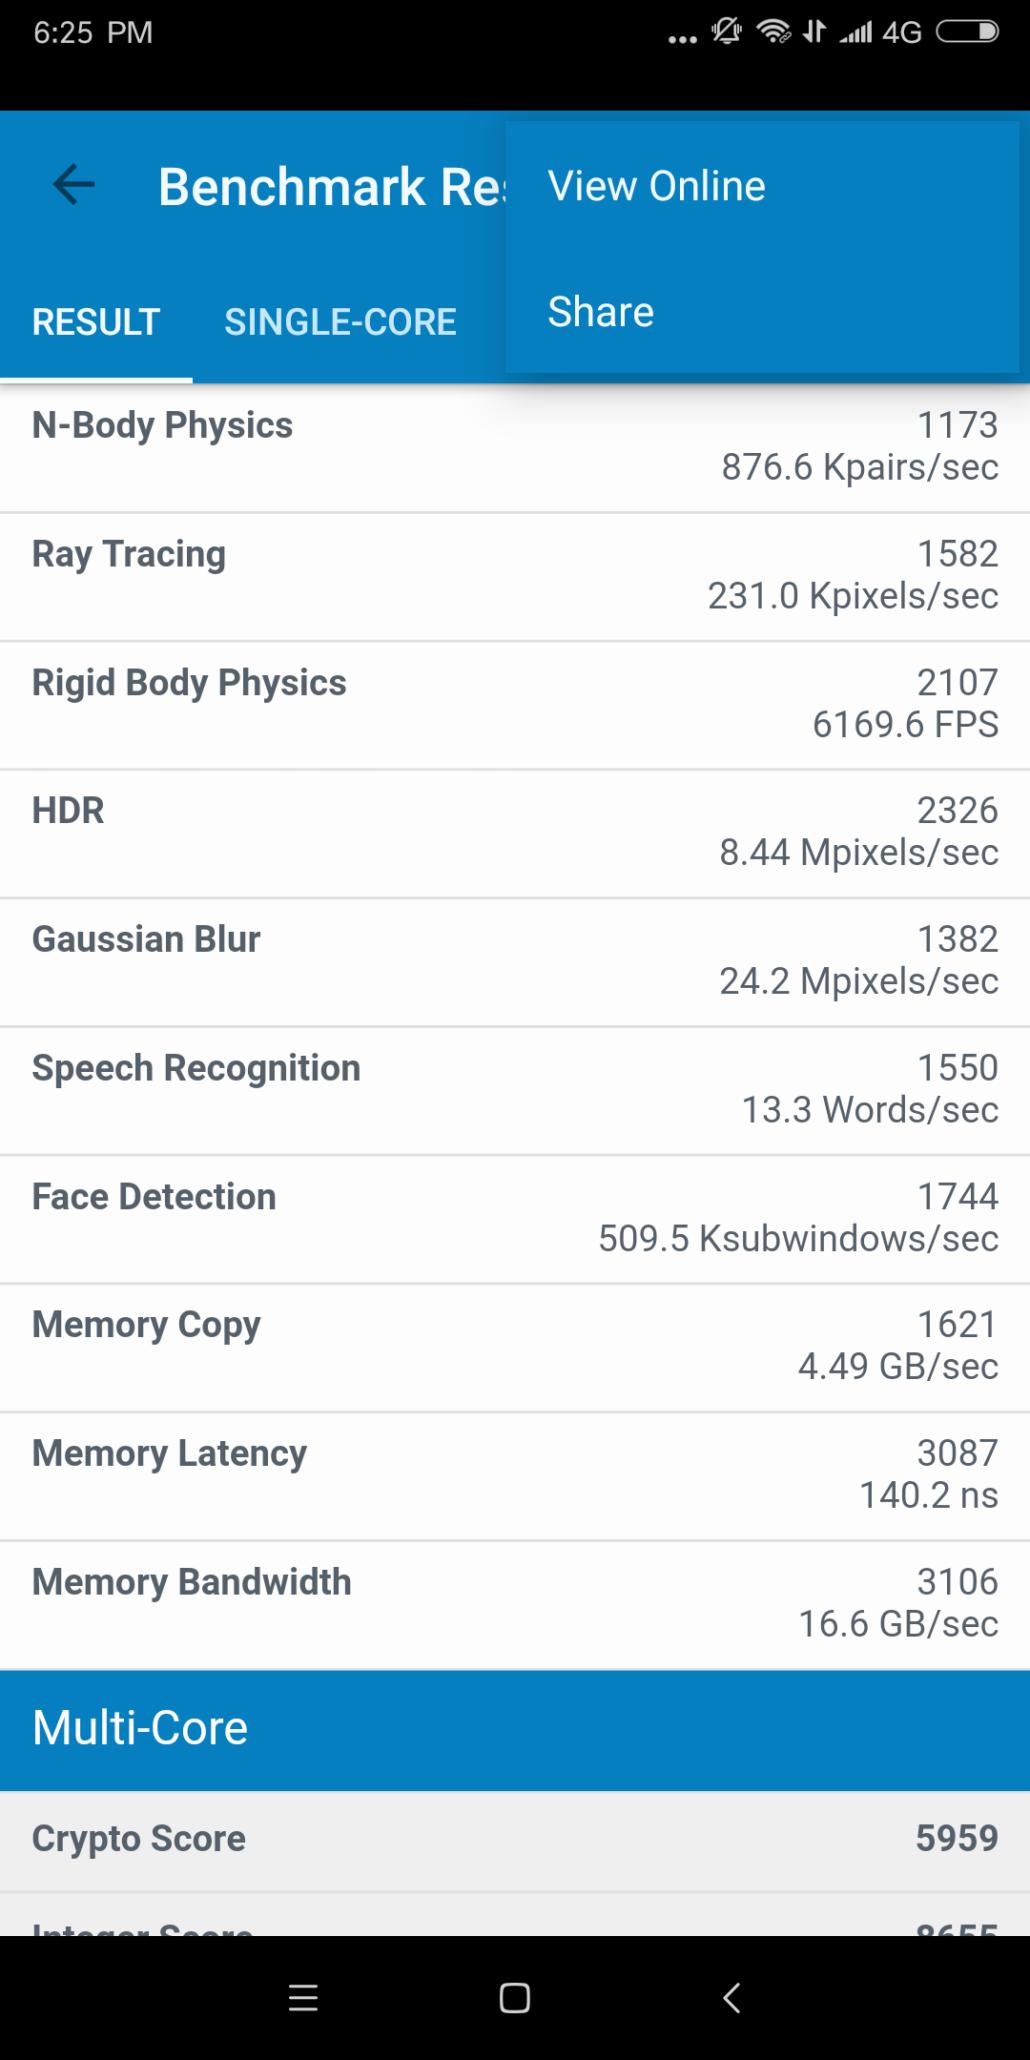 screenshot_2018-01-28-18-25-26-228_com-primatelabs-geekbench